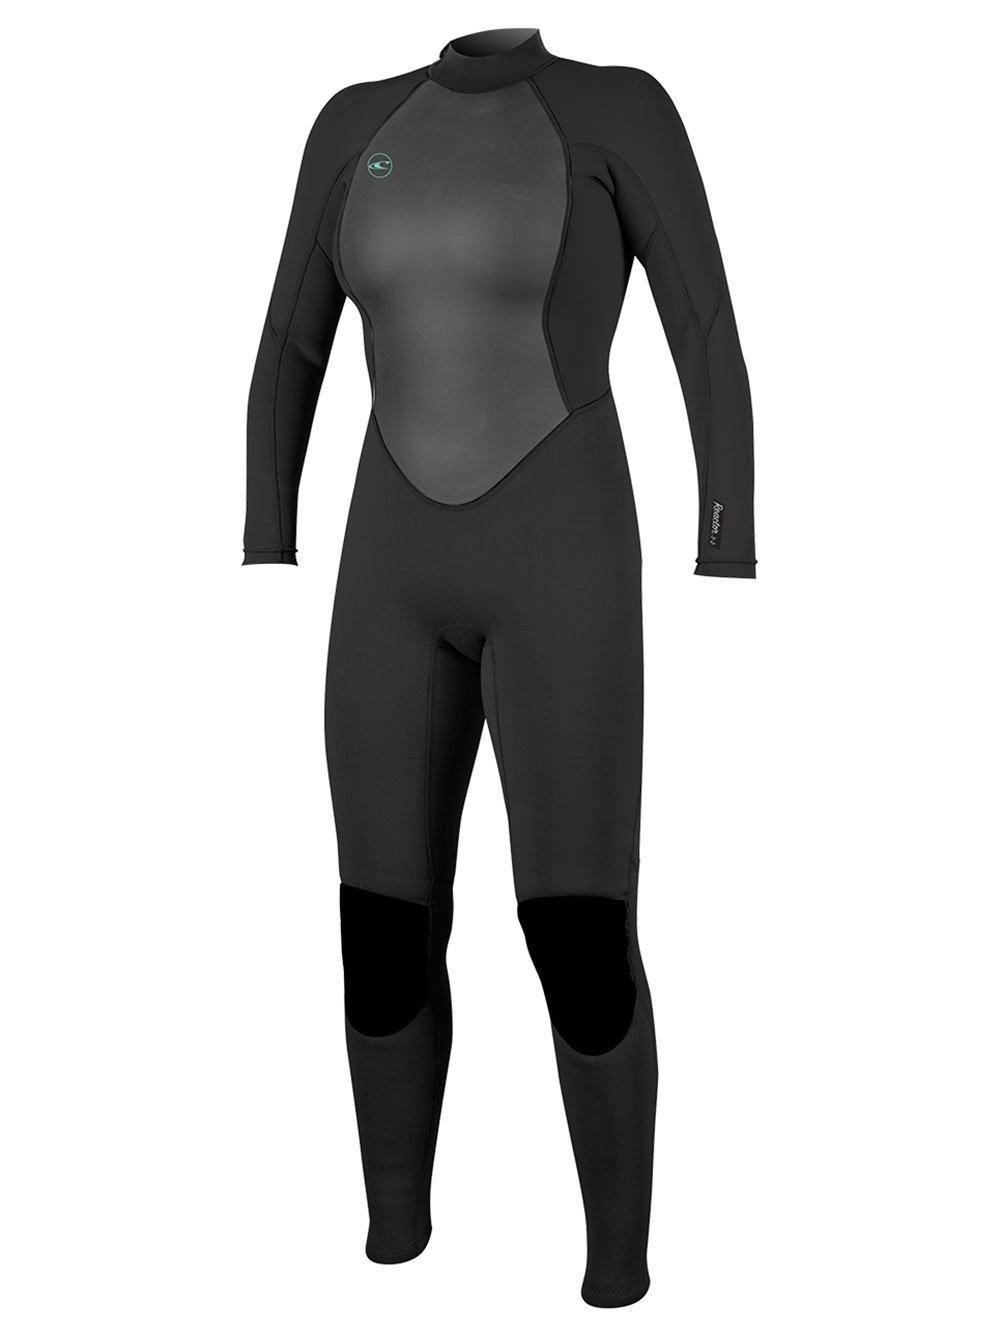 O'Neill Women's Reactor-2 3/2mm Back Zip Full Wetsuit, Black, 6